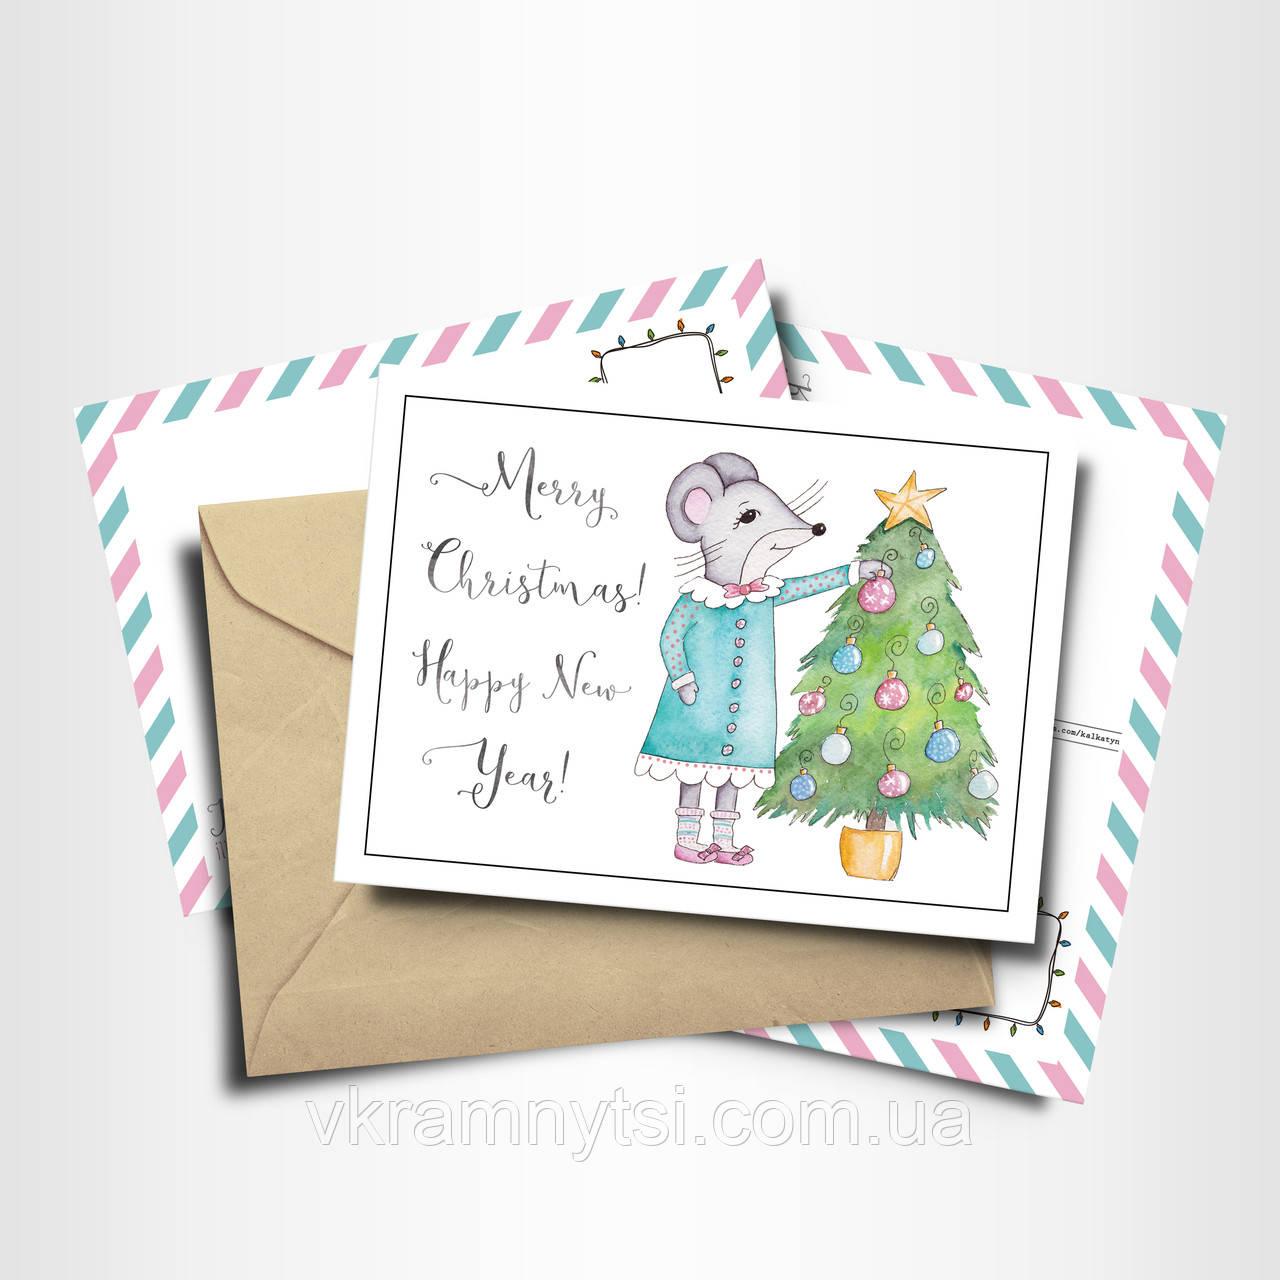 Листівка «Merry Christmas! Happy New Year!»